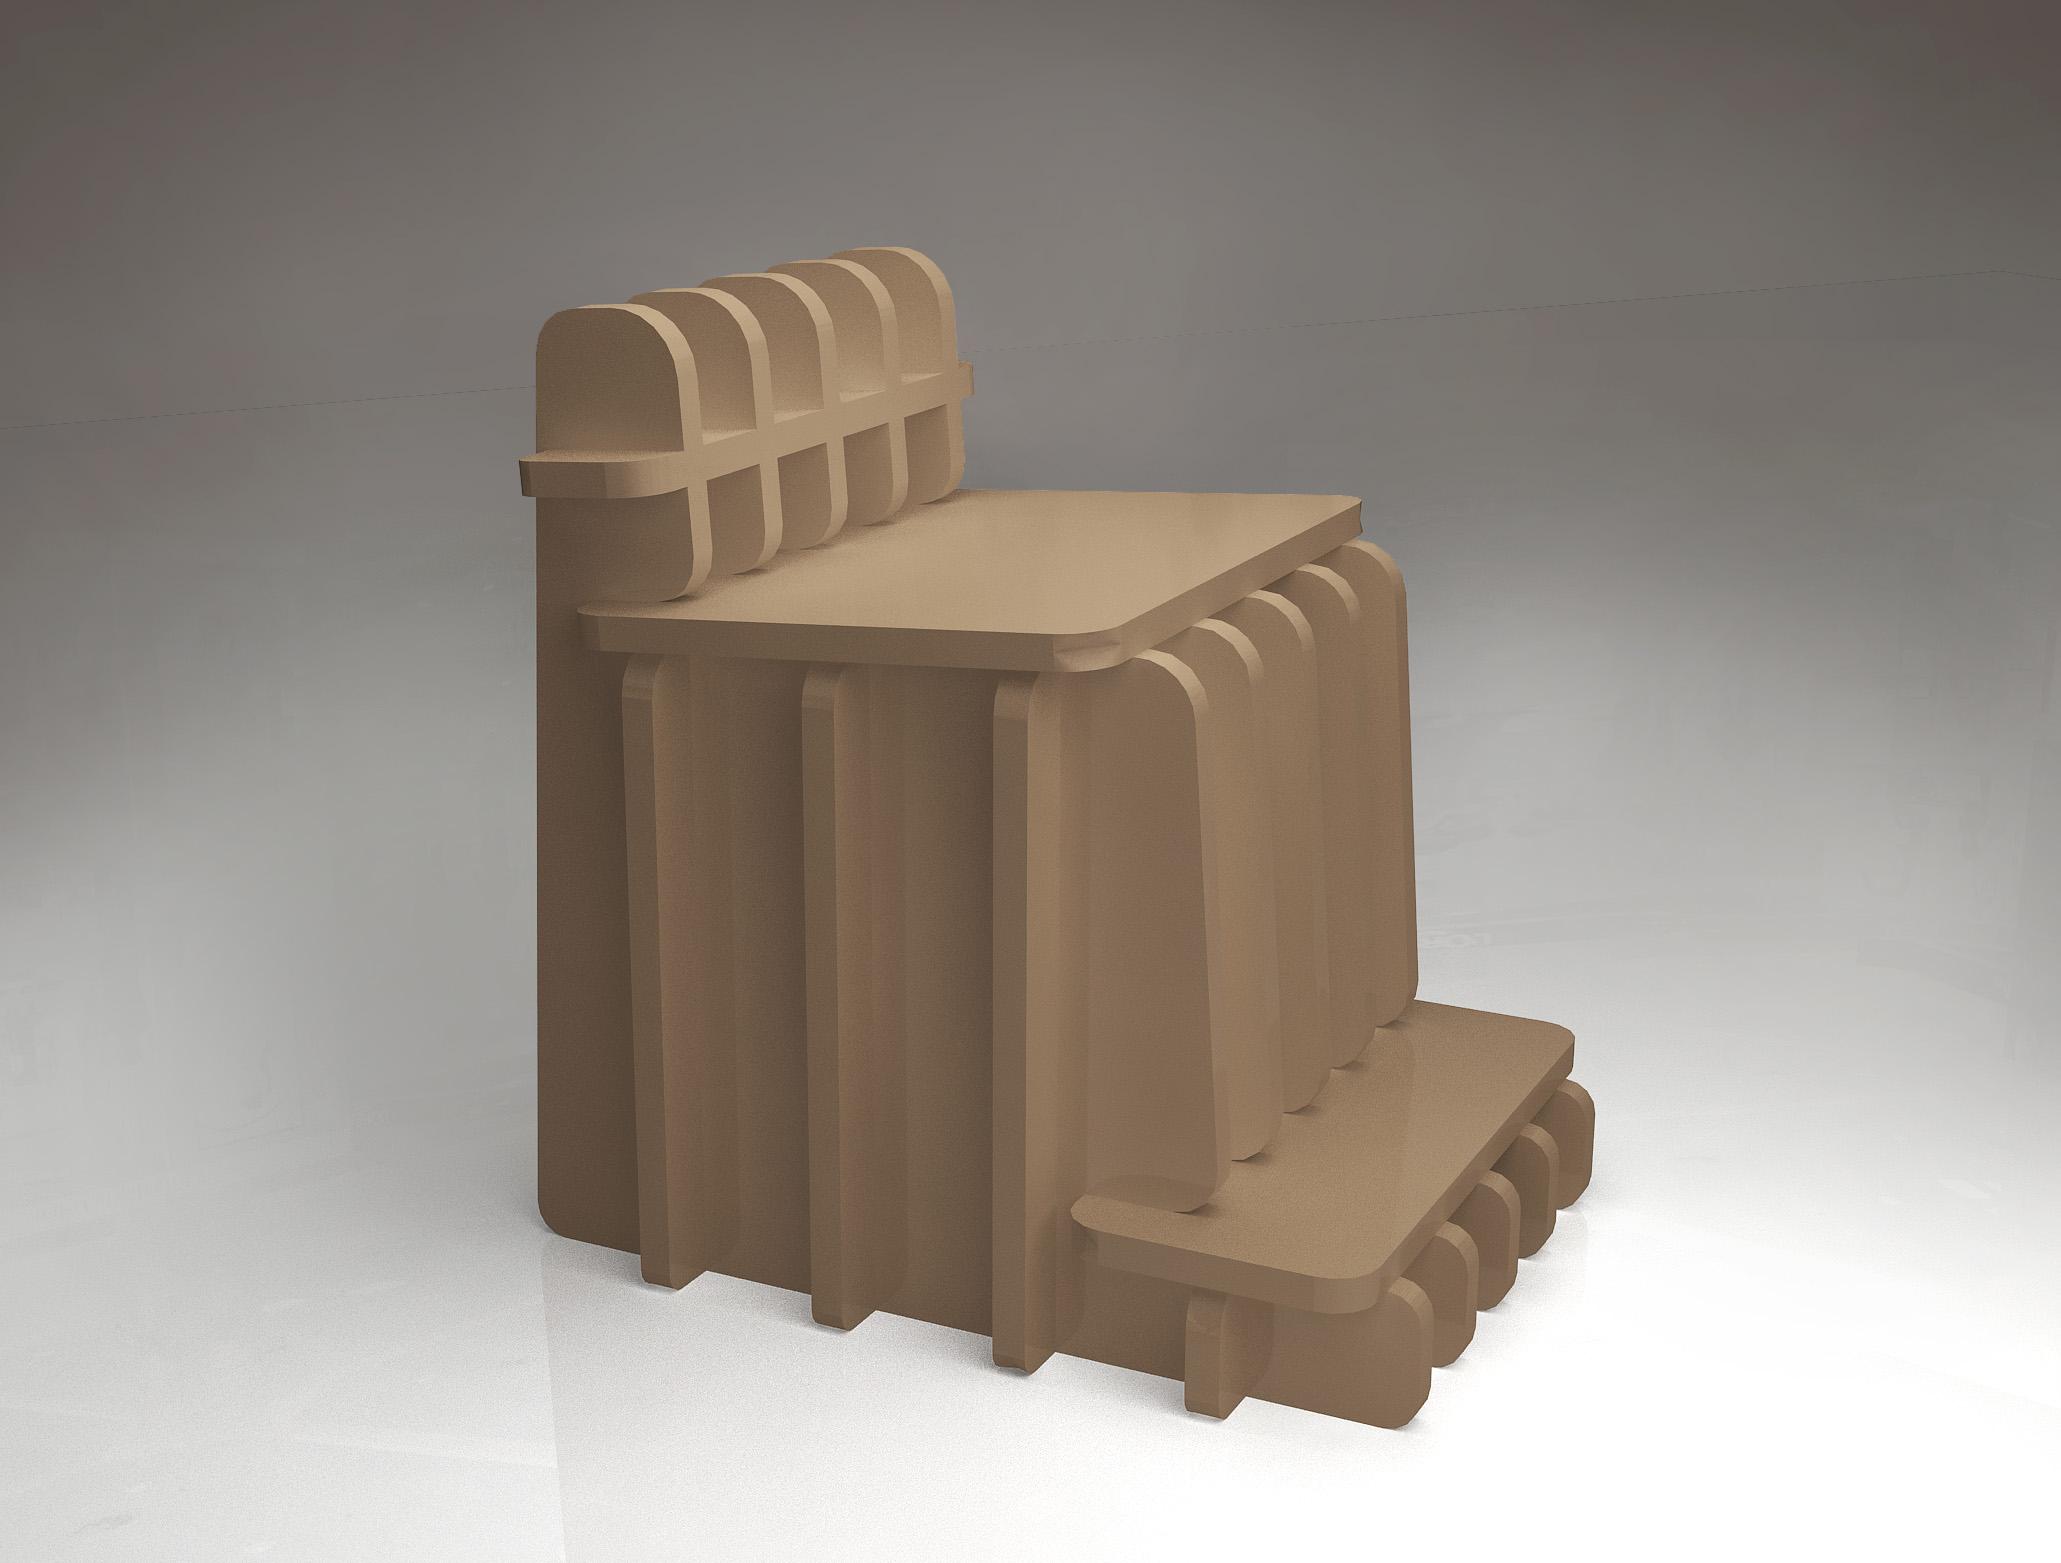 TG blow dry bar styling chair cardboard .jpg